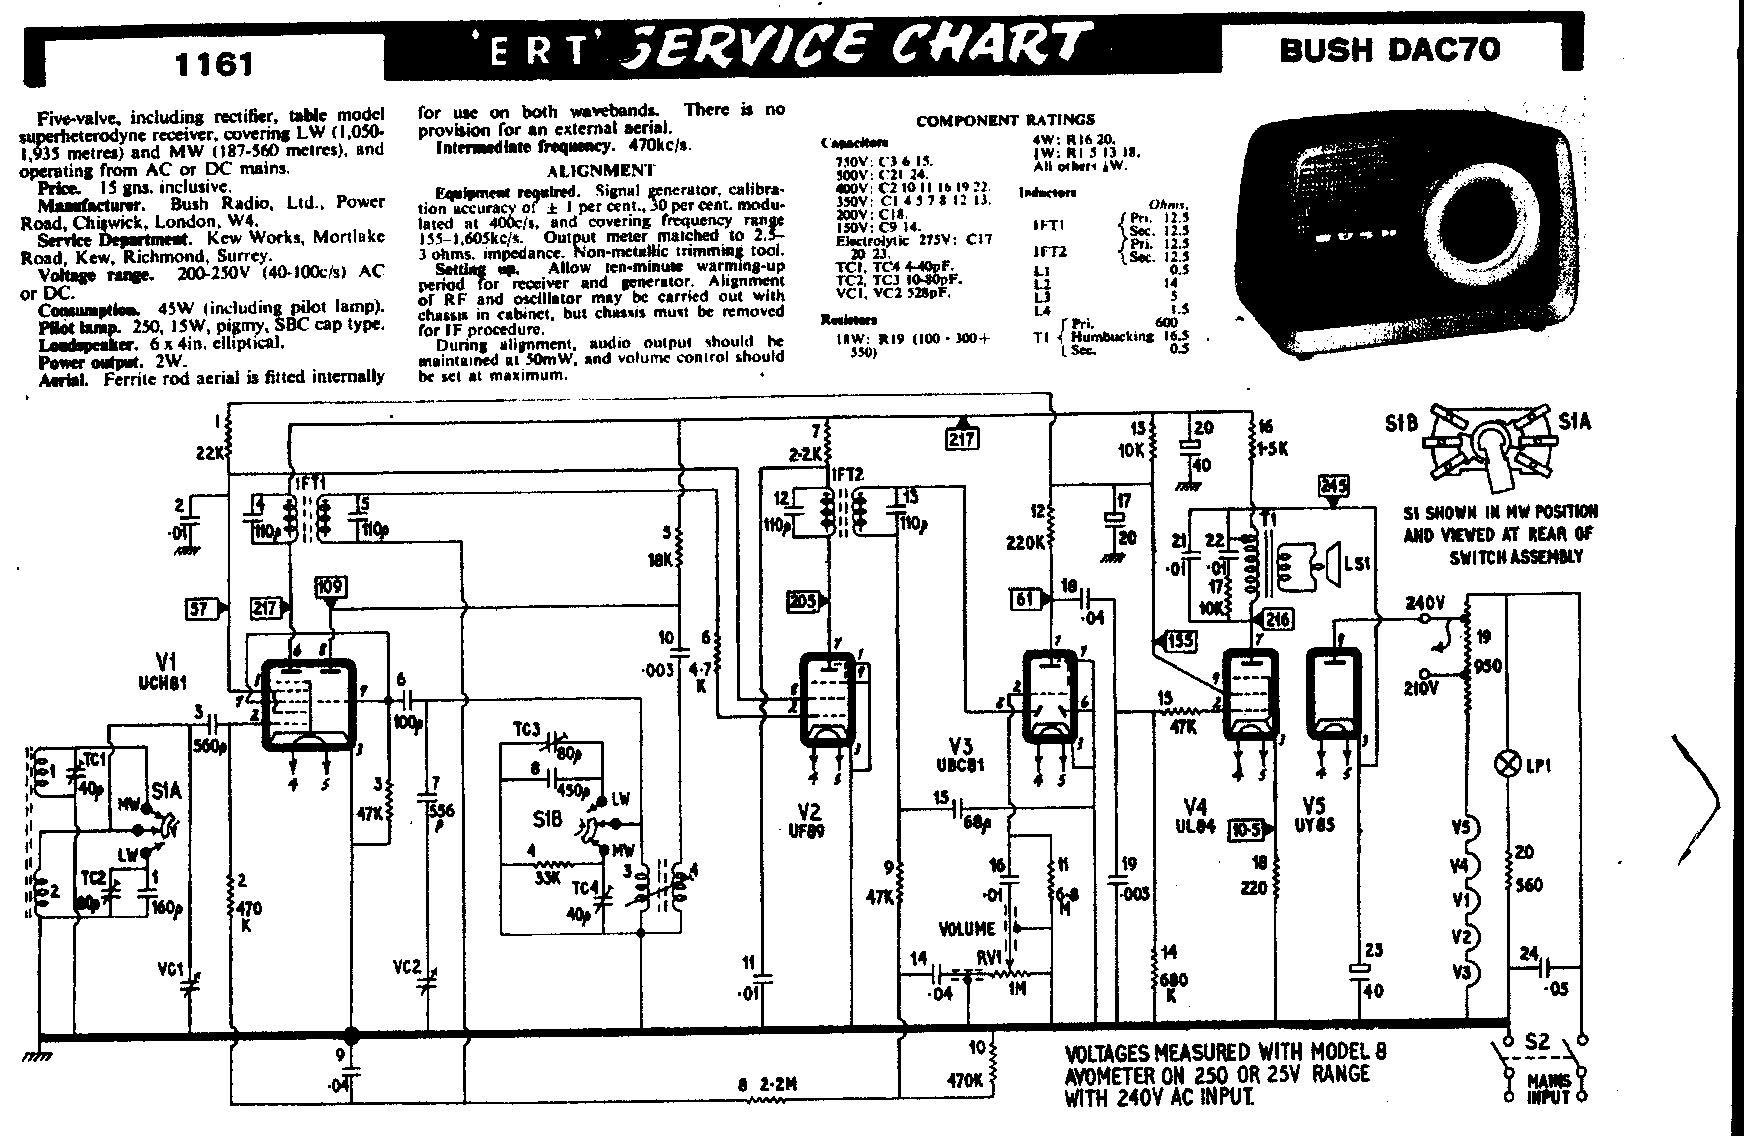 vintage radio and electronics bush dac70